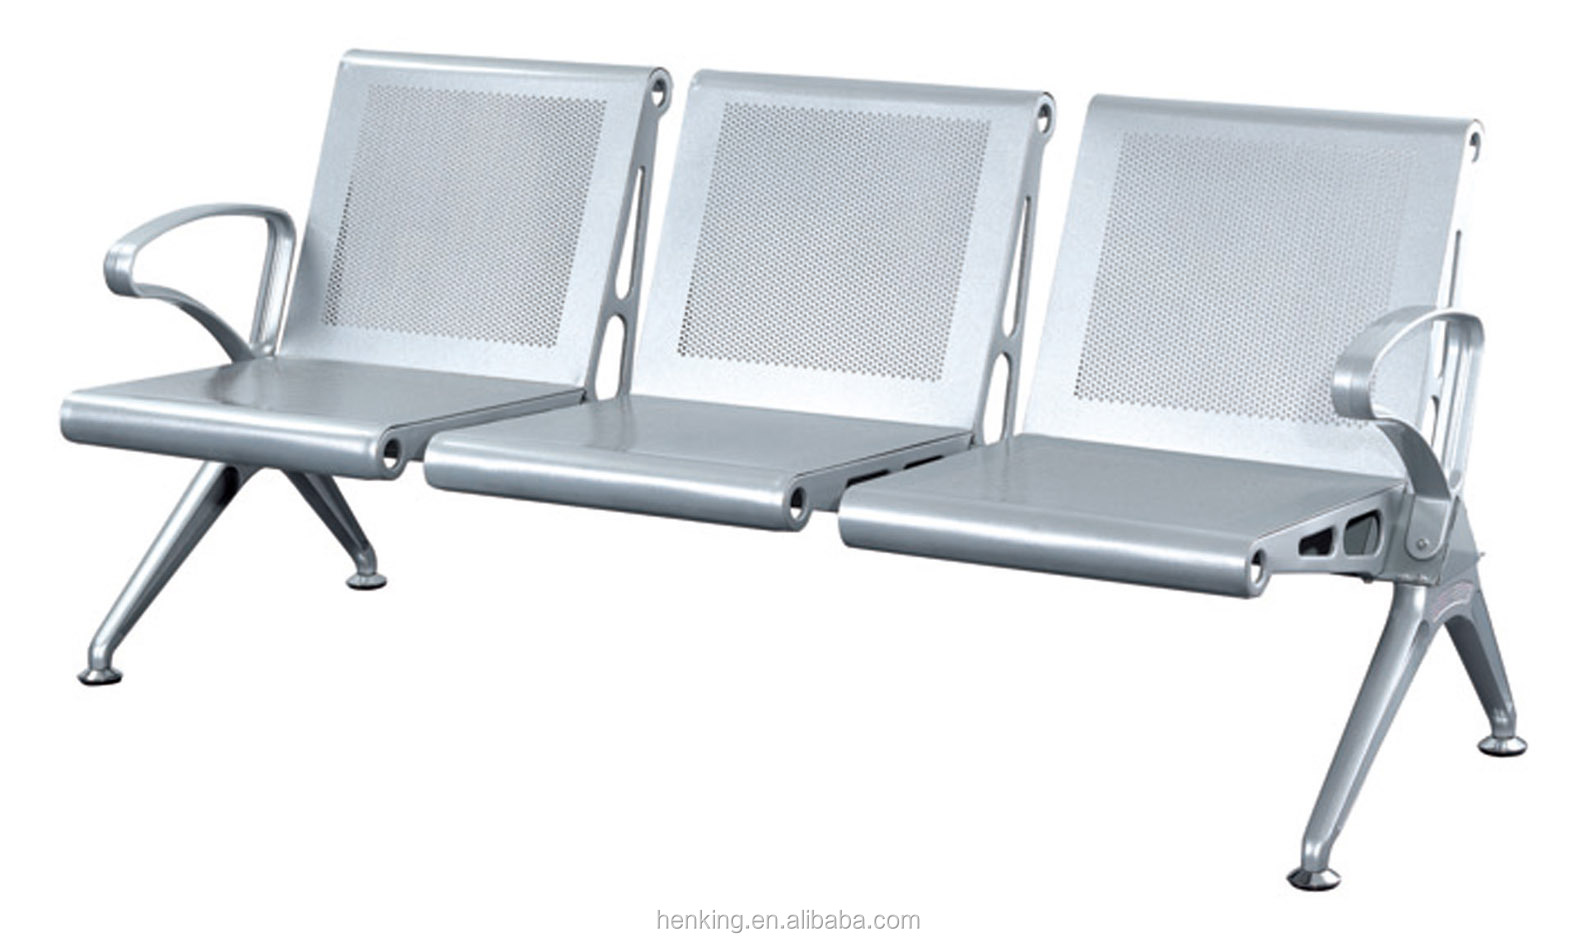 City Furniture Warranty